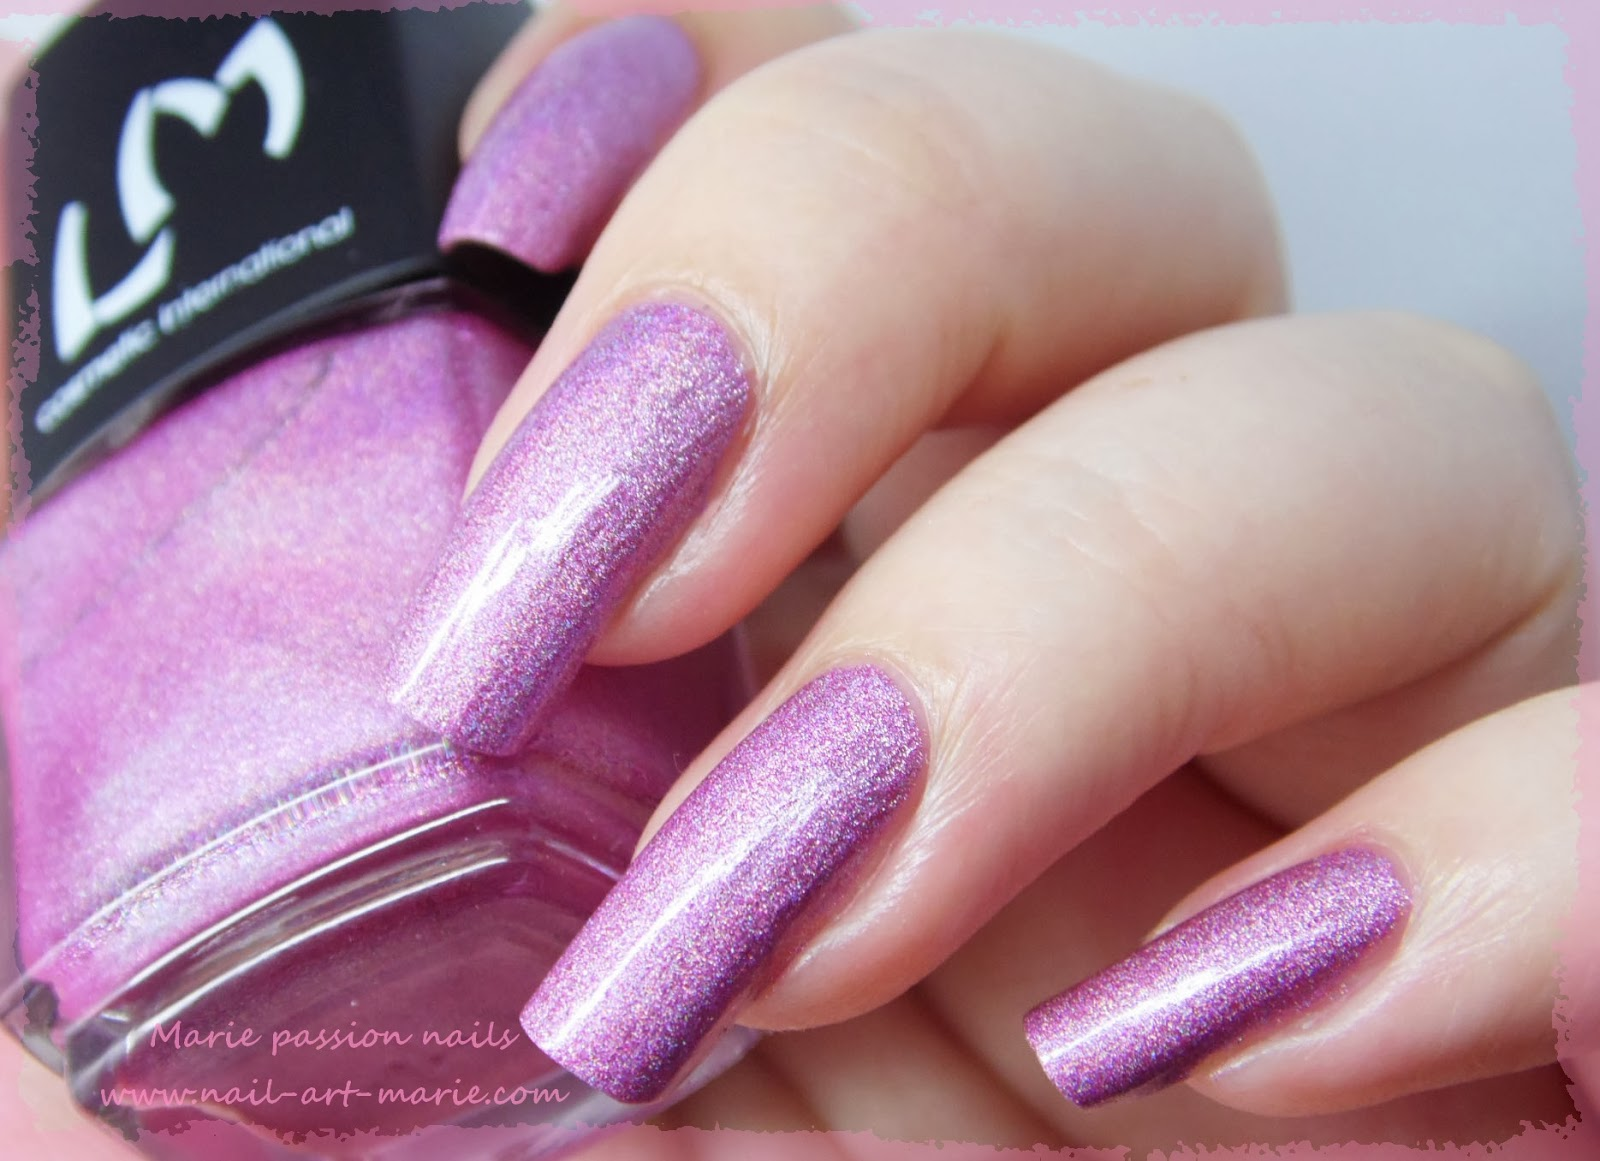 LM Cosmetic Izar6